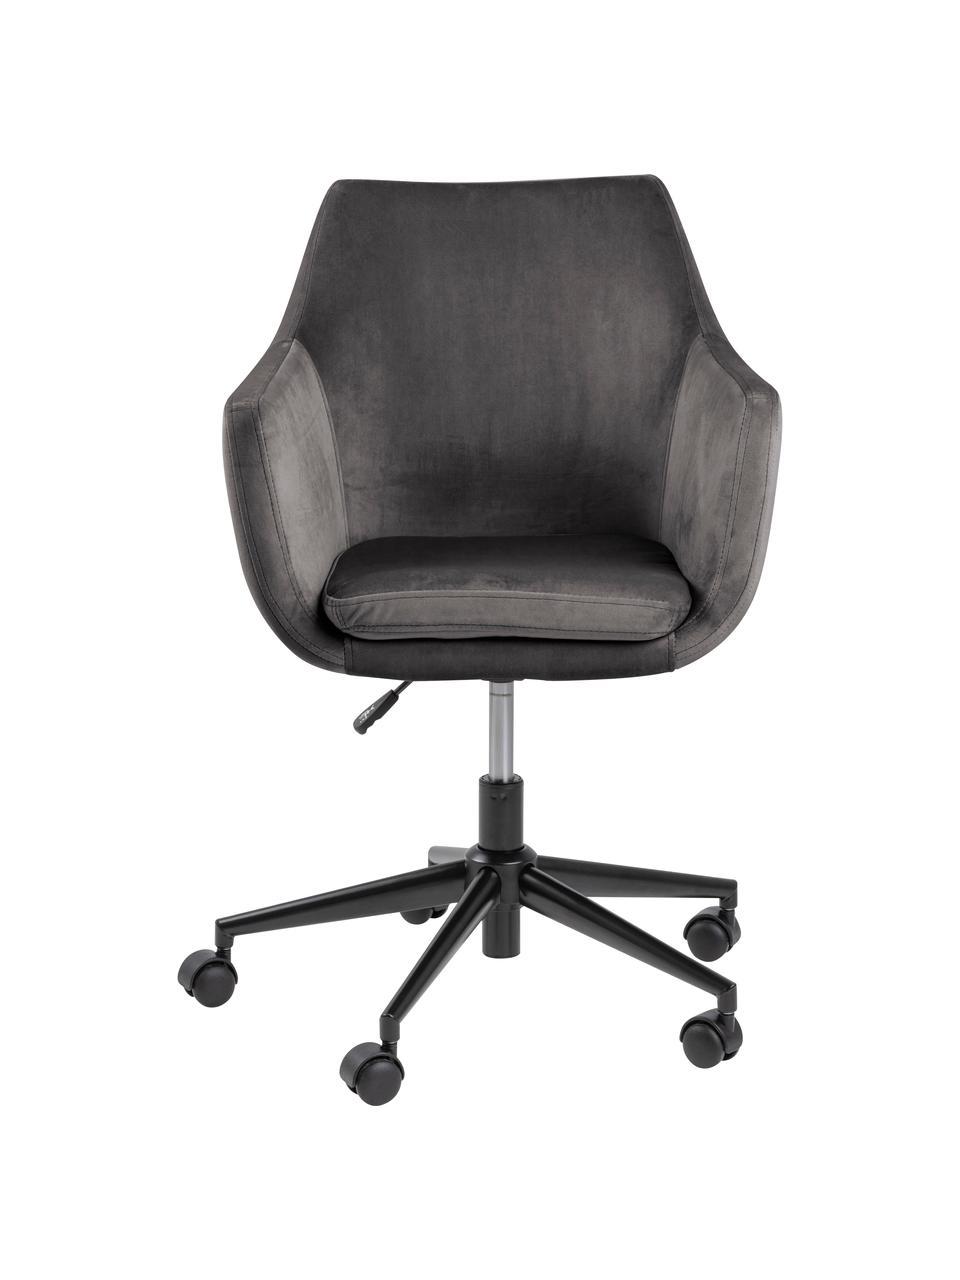 Samt-Bürodrehstuhl Nora, höhenverstellbar, Bezug: Polyester (Samt) 25.000 S, Gestell: Metall, pulverbeschichtet, Samt Dunkelgrau, B 58 x T 58 cm